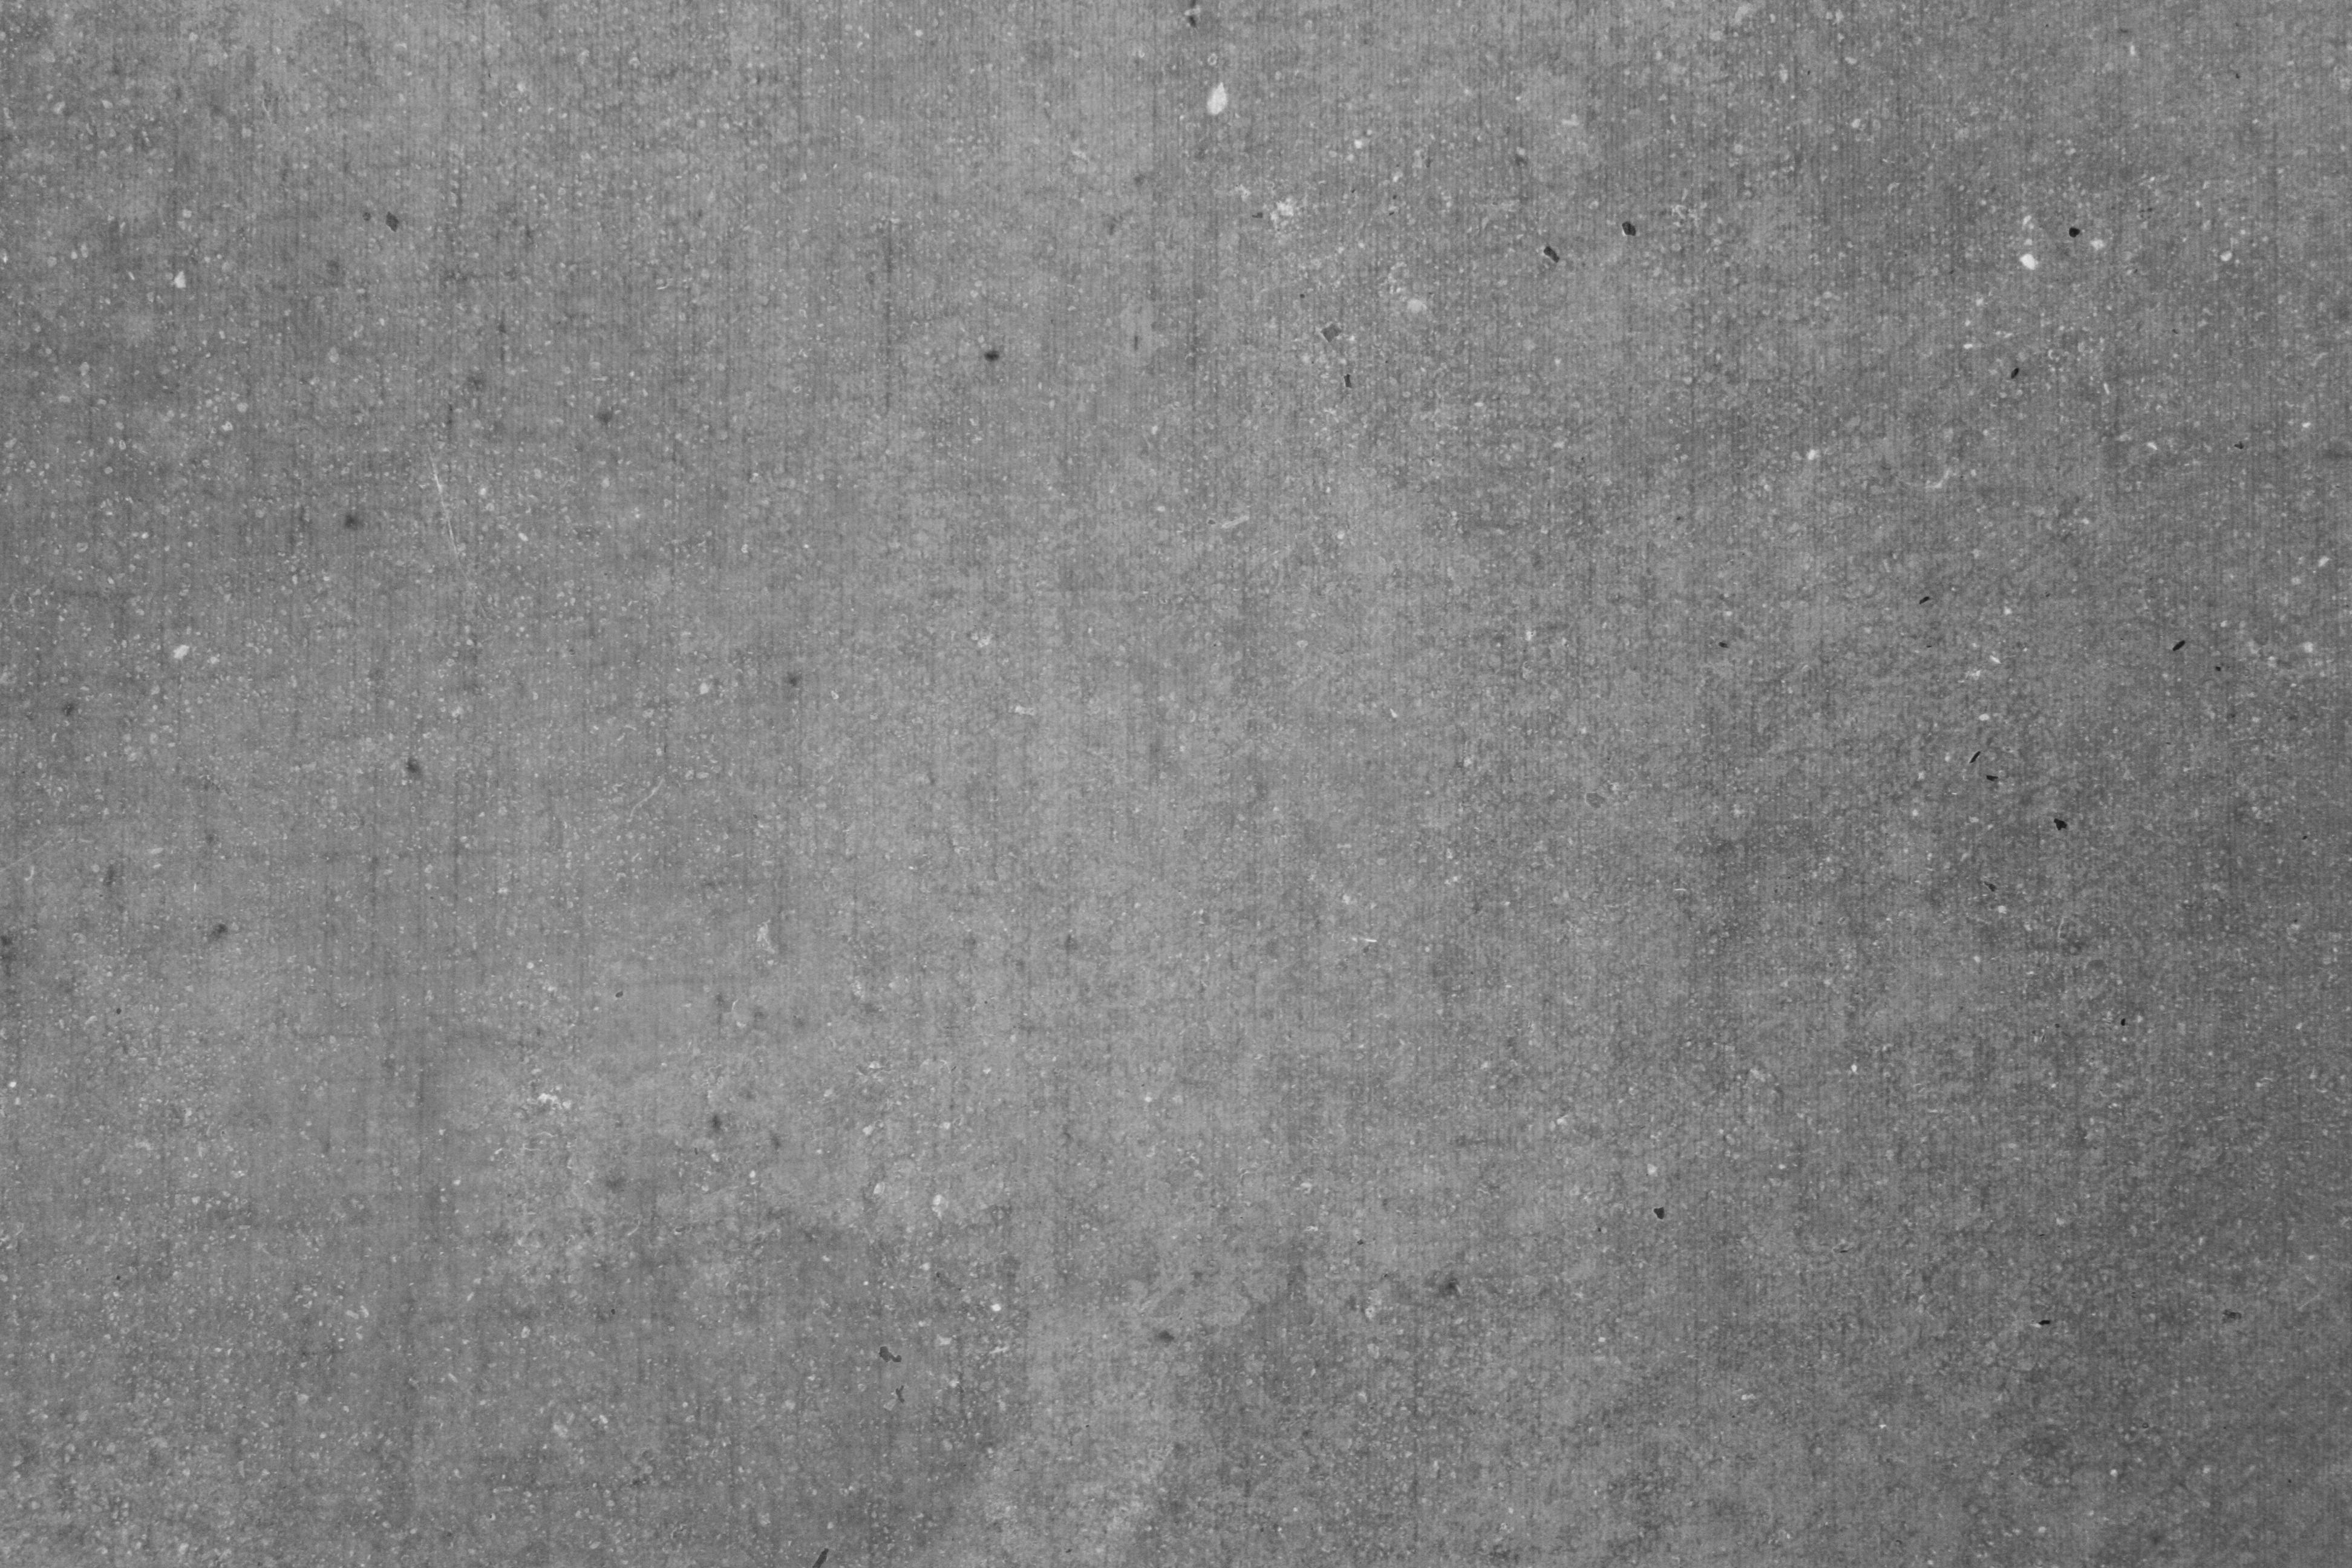 Free Concrete Grey Grunge Textures Texture L T